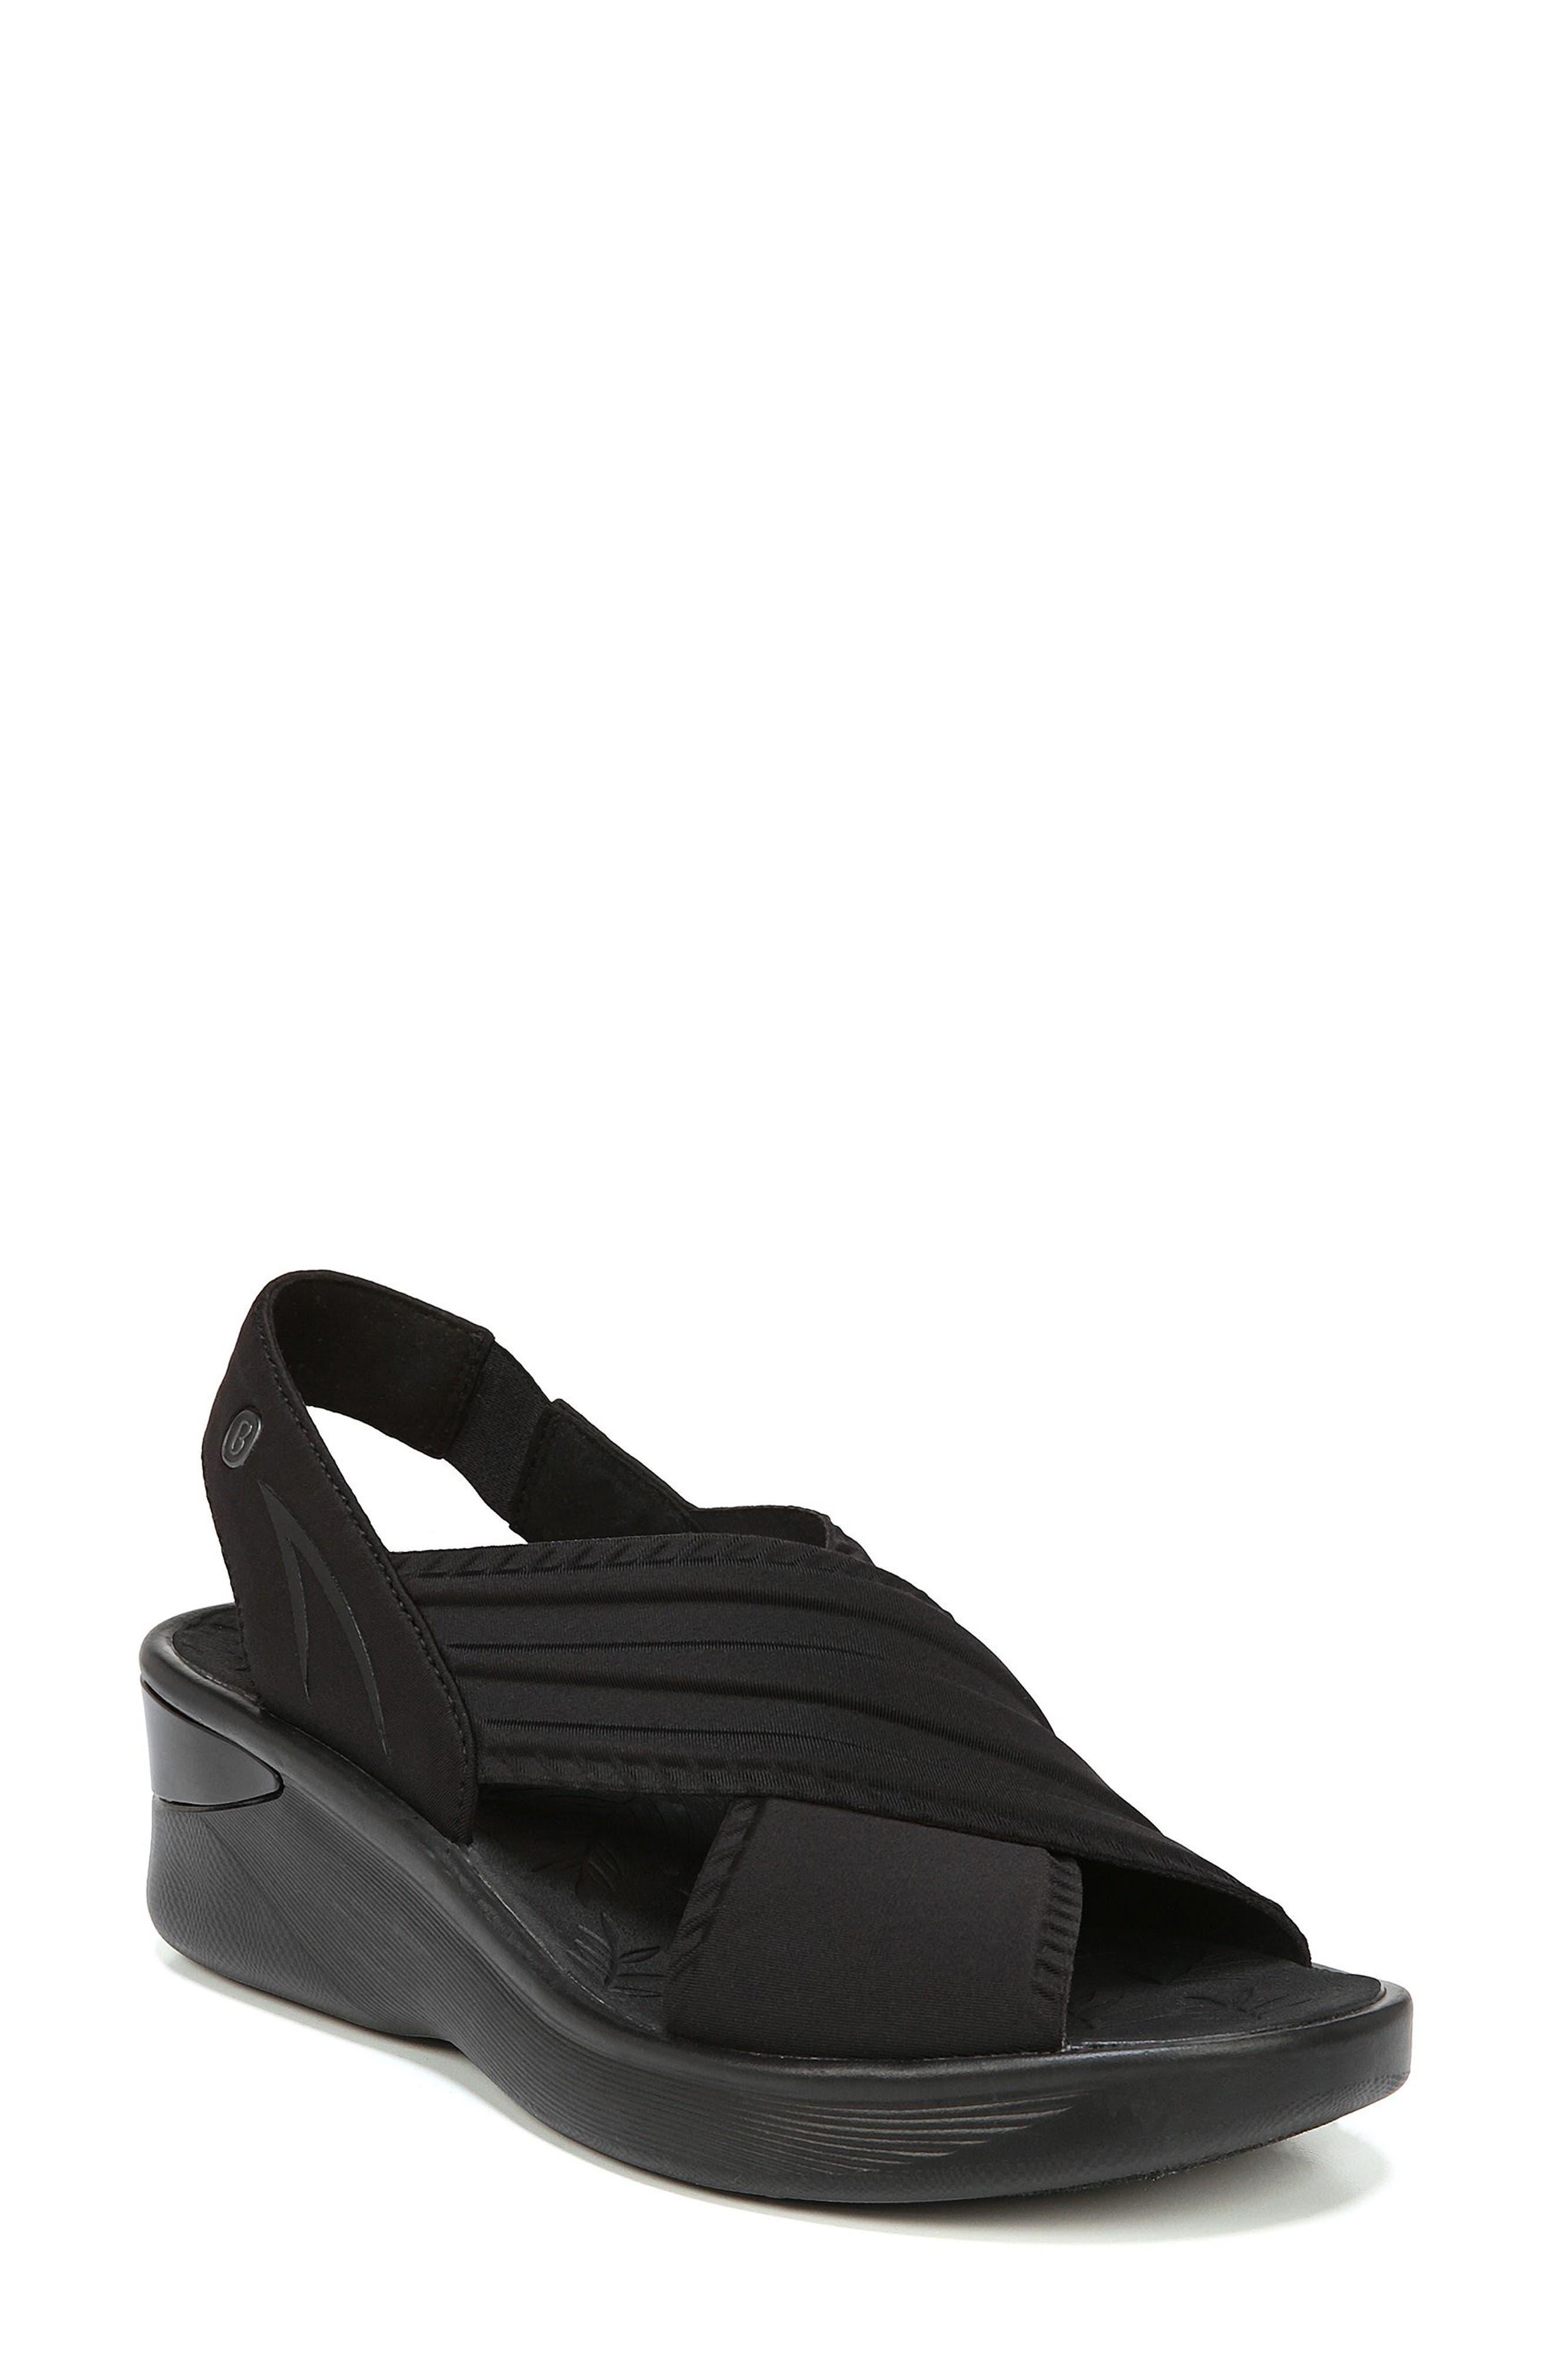 Sunset Wedge Sandal,                             Main thumbnail 1, color,                             BLACK FABRIC